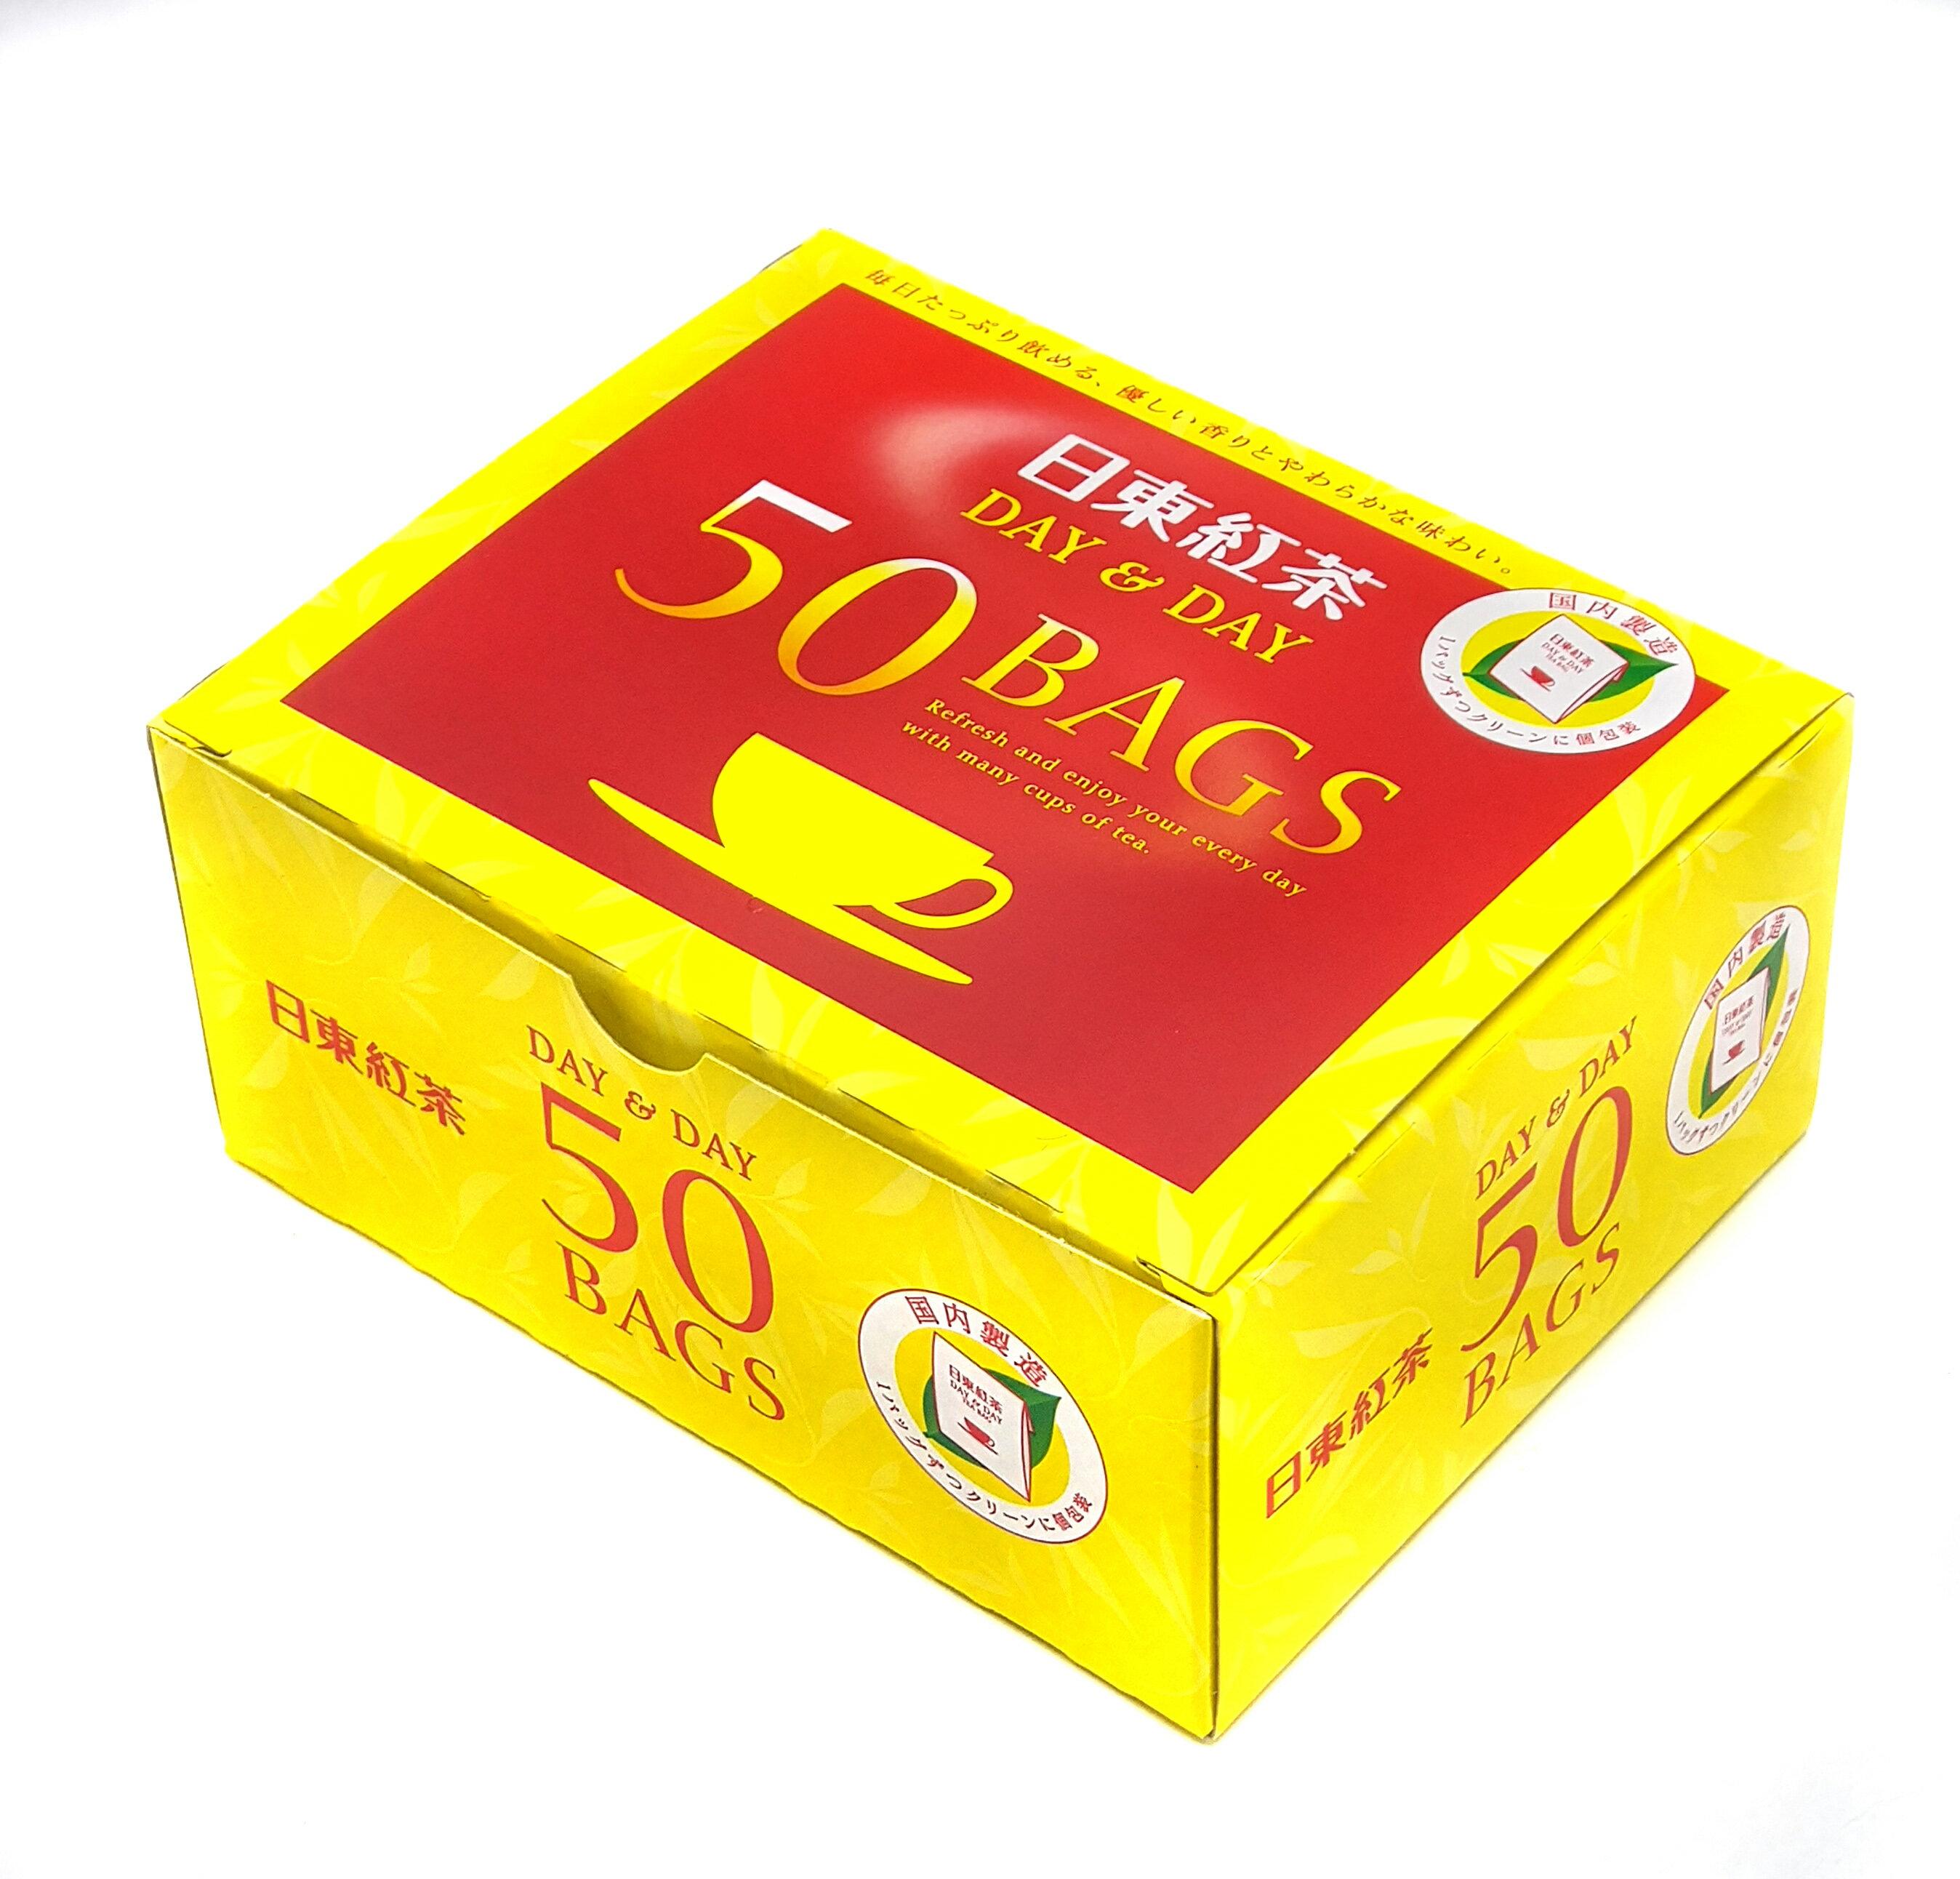 《Chara 微百貨》日東 紅茶 豆香 拿鐵 萊姆 皇家奶茶 片岡 伯爵 奶茶 抹茶 twinings 歐蕾 宇治 4